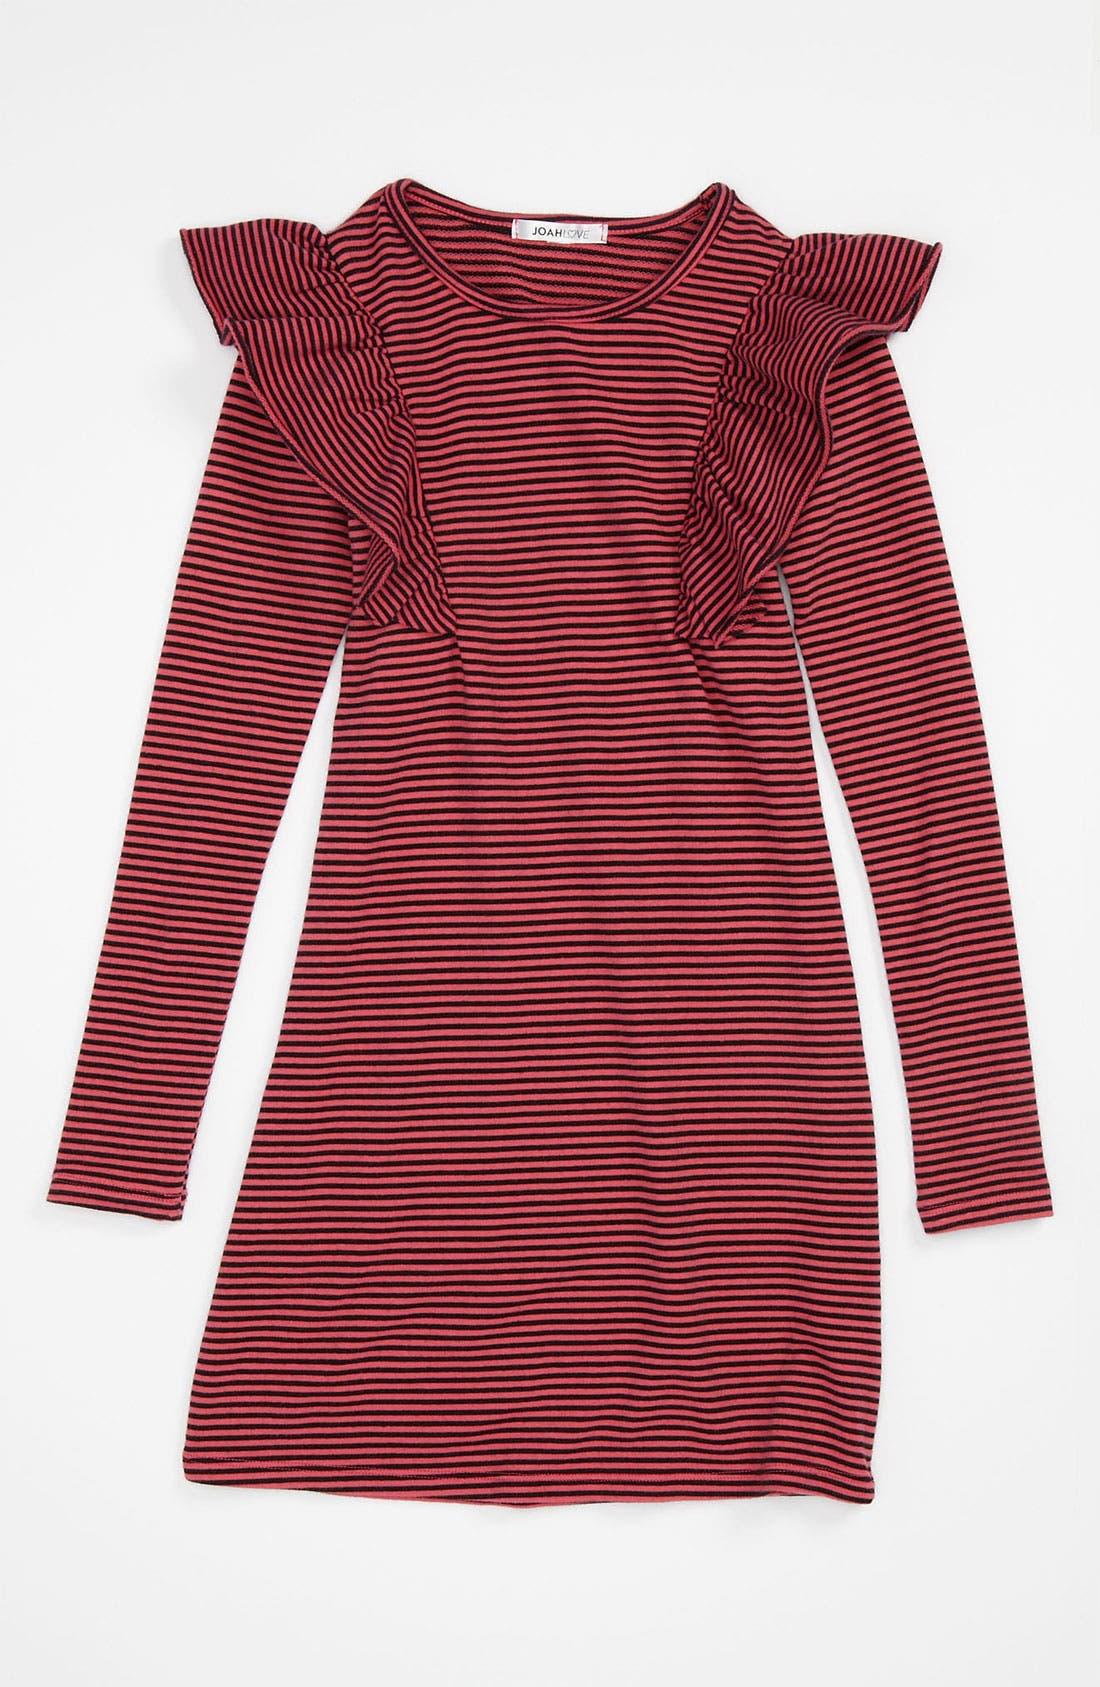 Main Image - Joah Love Stripe Mod Dress (Little Girls & Big Girls)